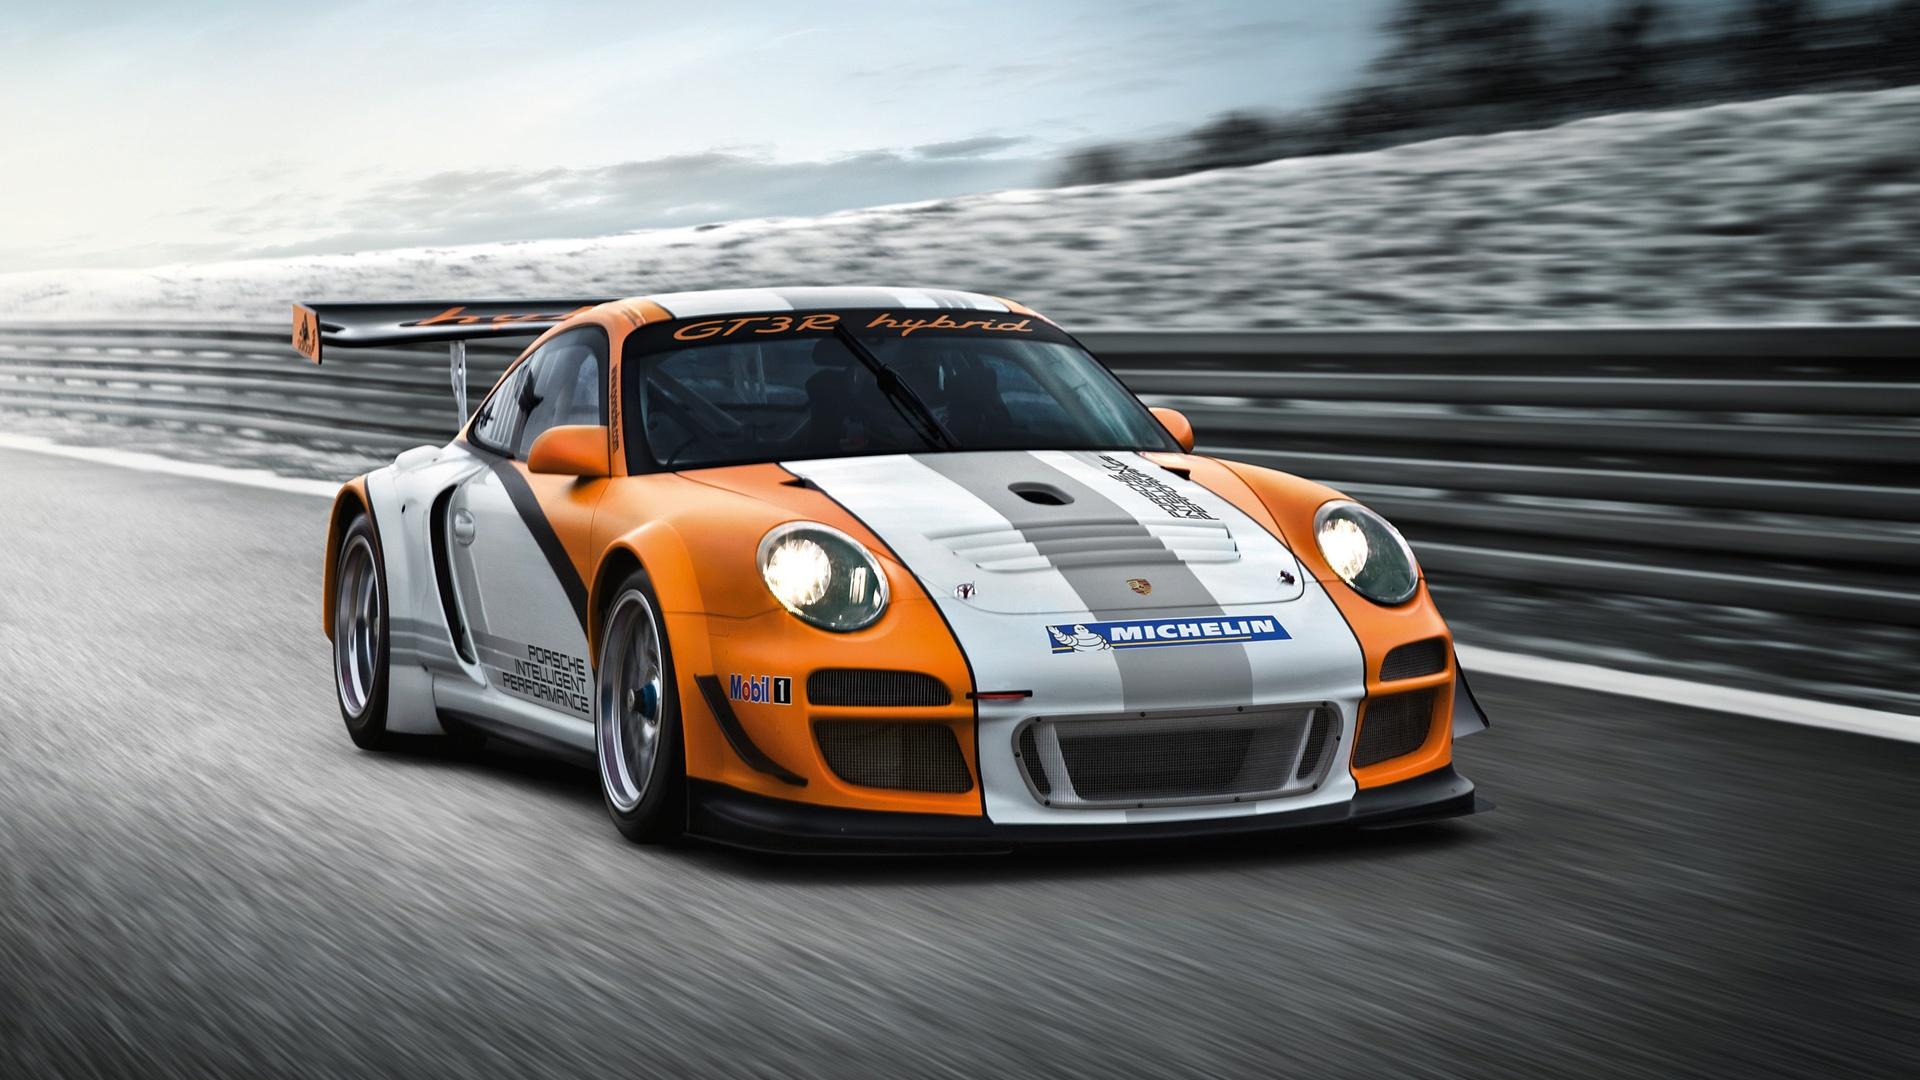 Porsche GT3 Rybrid HD Wallpapers 1080p Cars HD Wallpapers Source 1920x1080